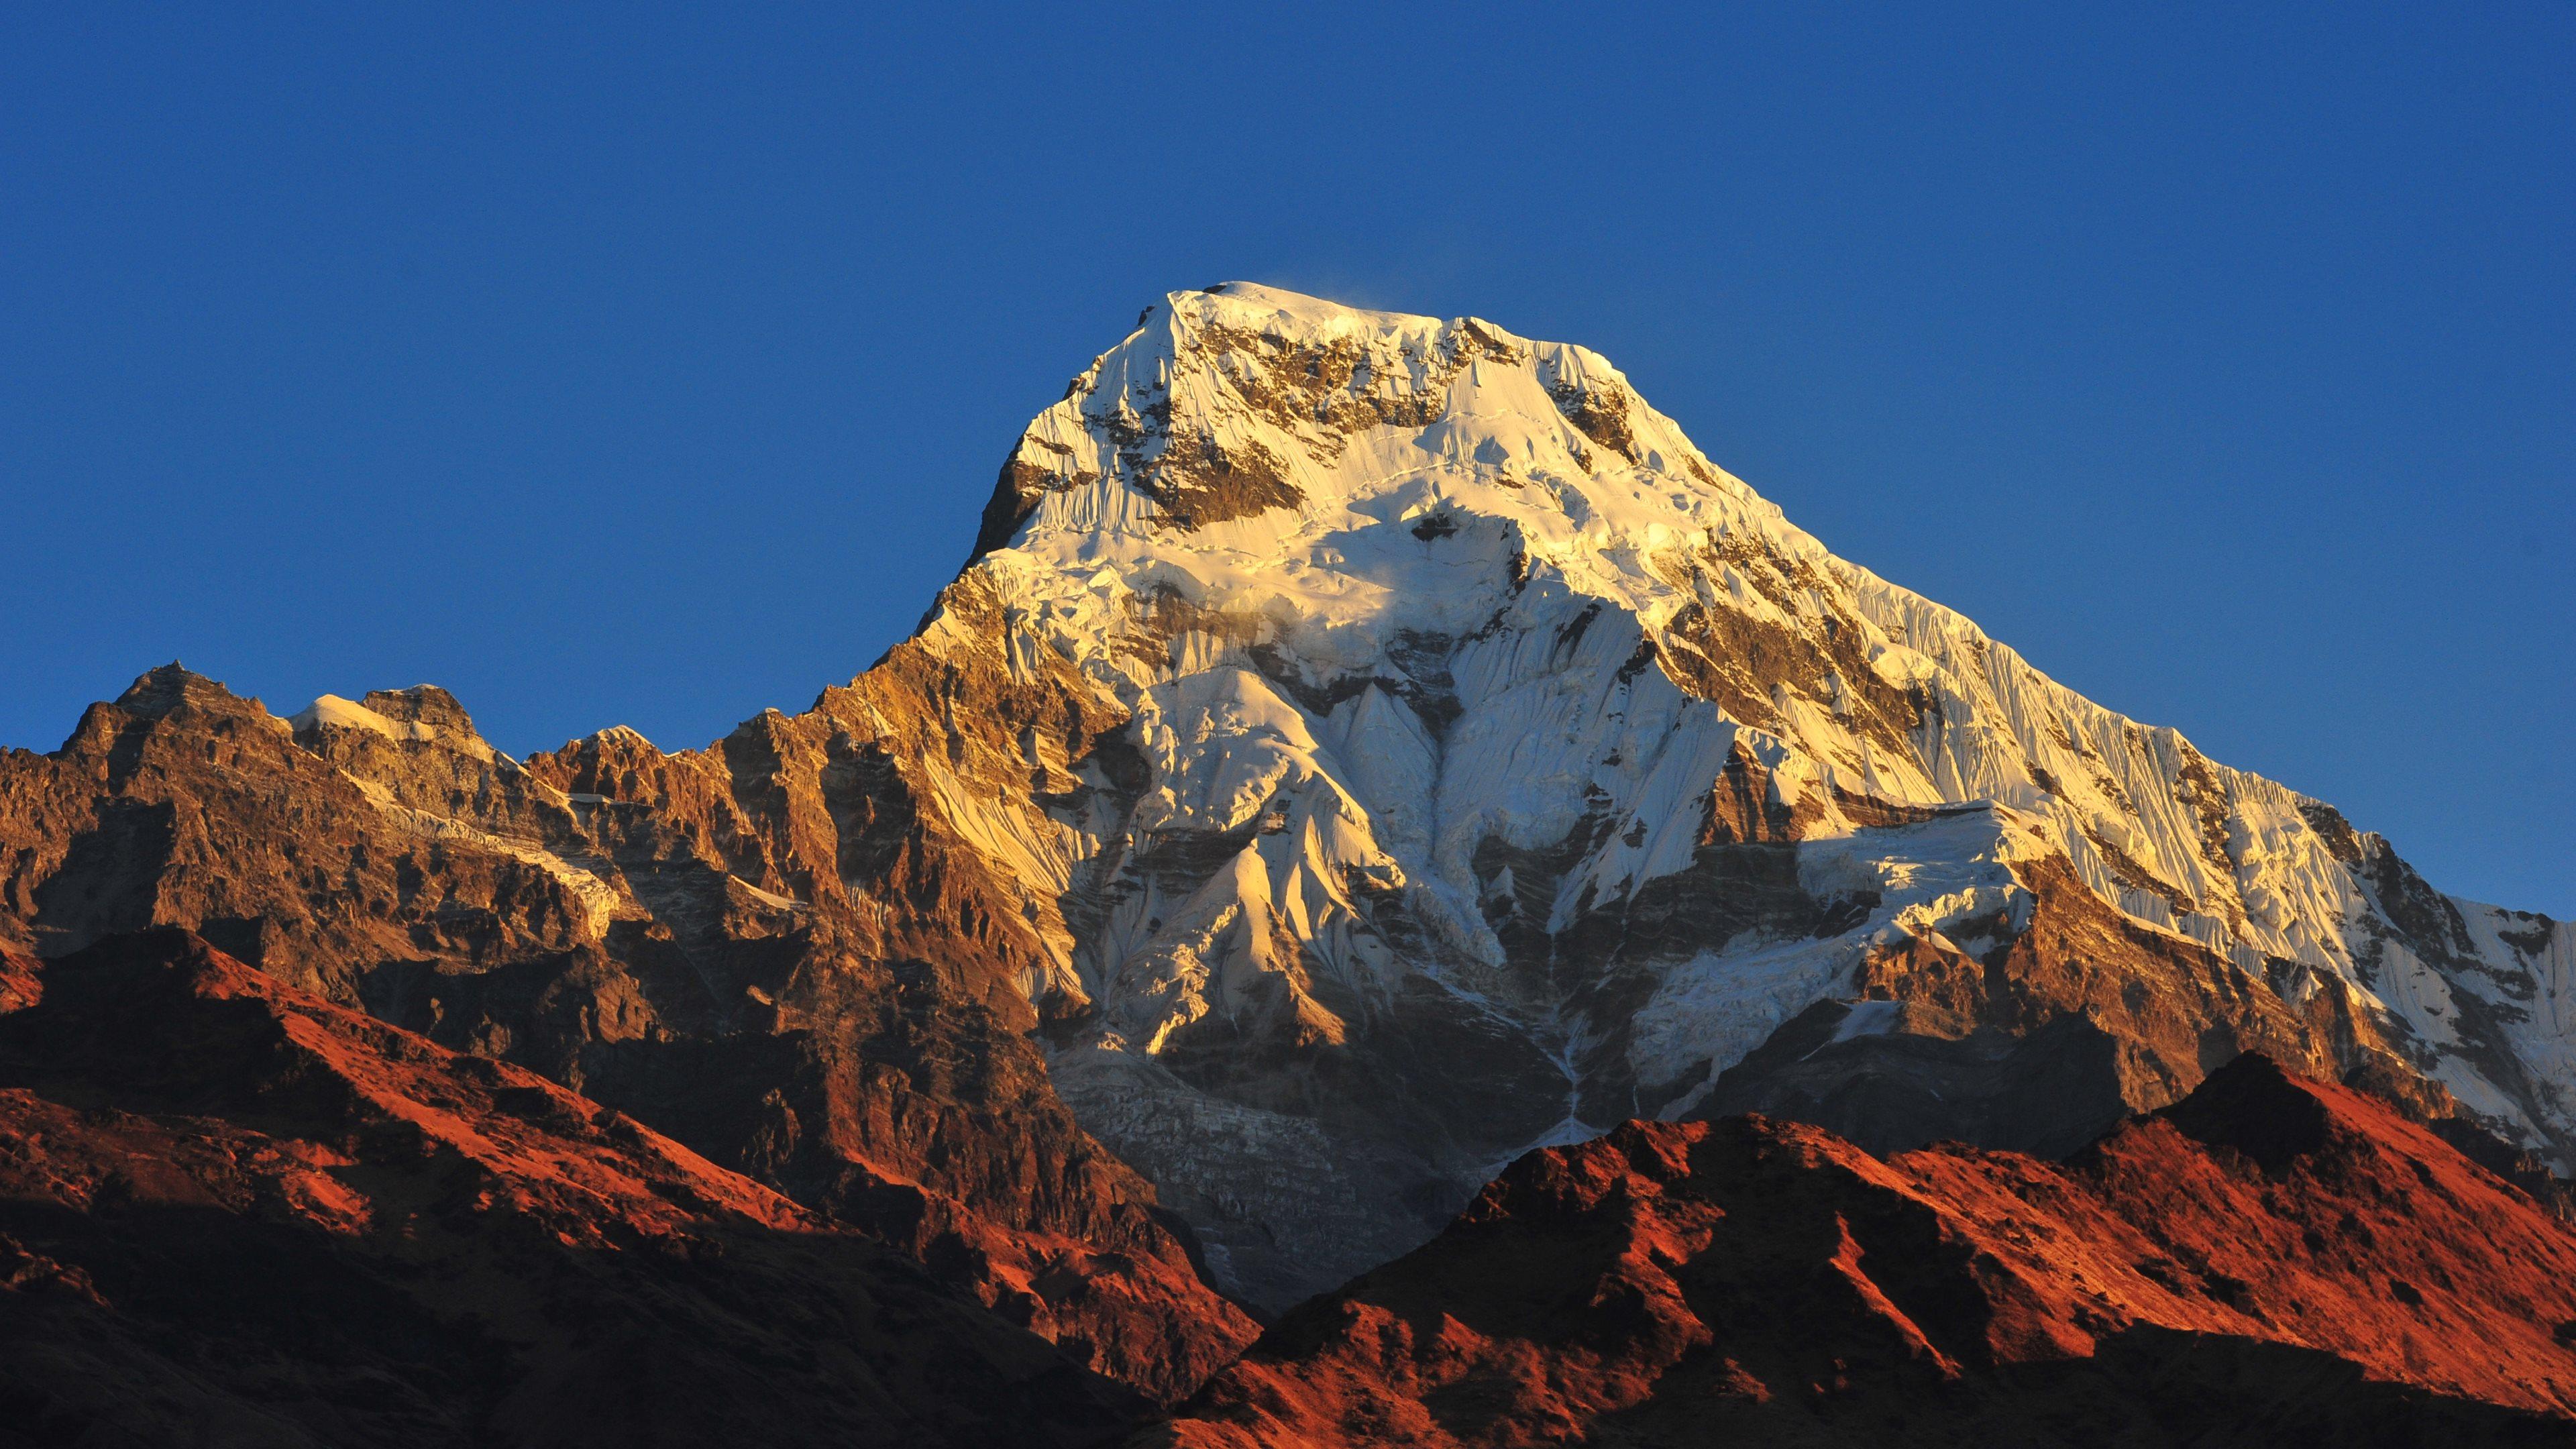 2048x2048 Game Girl Pubg 4k Ipad Air Hd 4k Wallpapers: 2048x2048 Annapurna Massif Mountain Range Nepal 4k Ipad